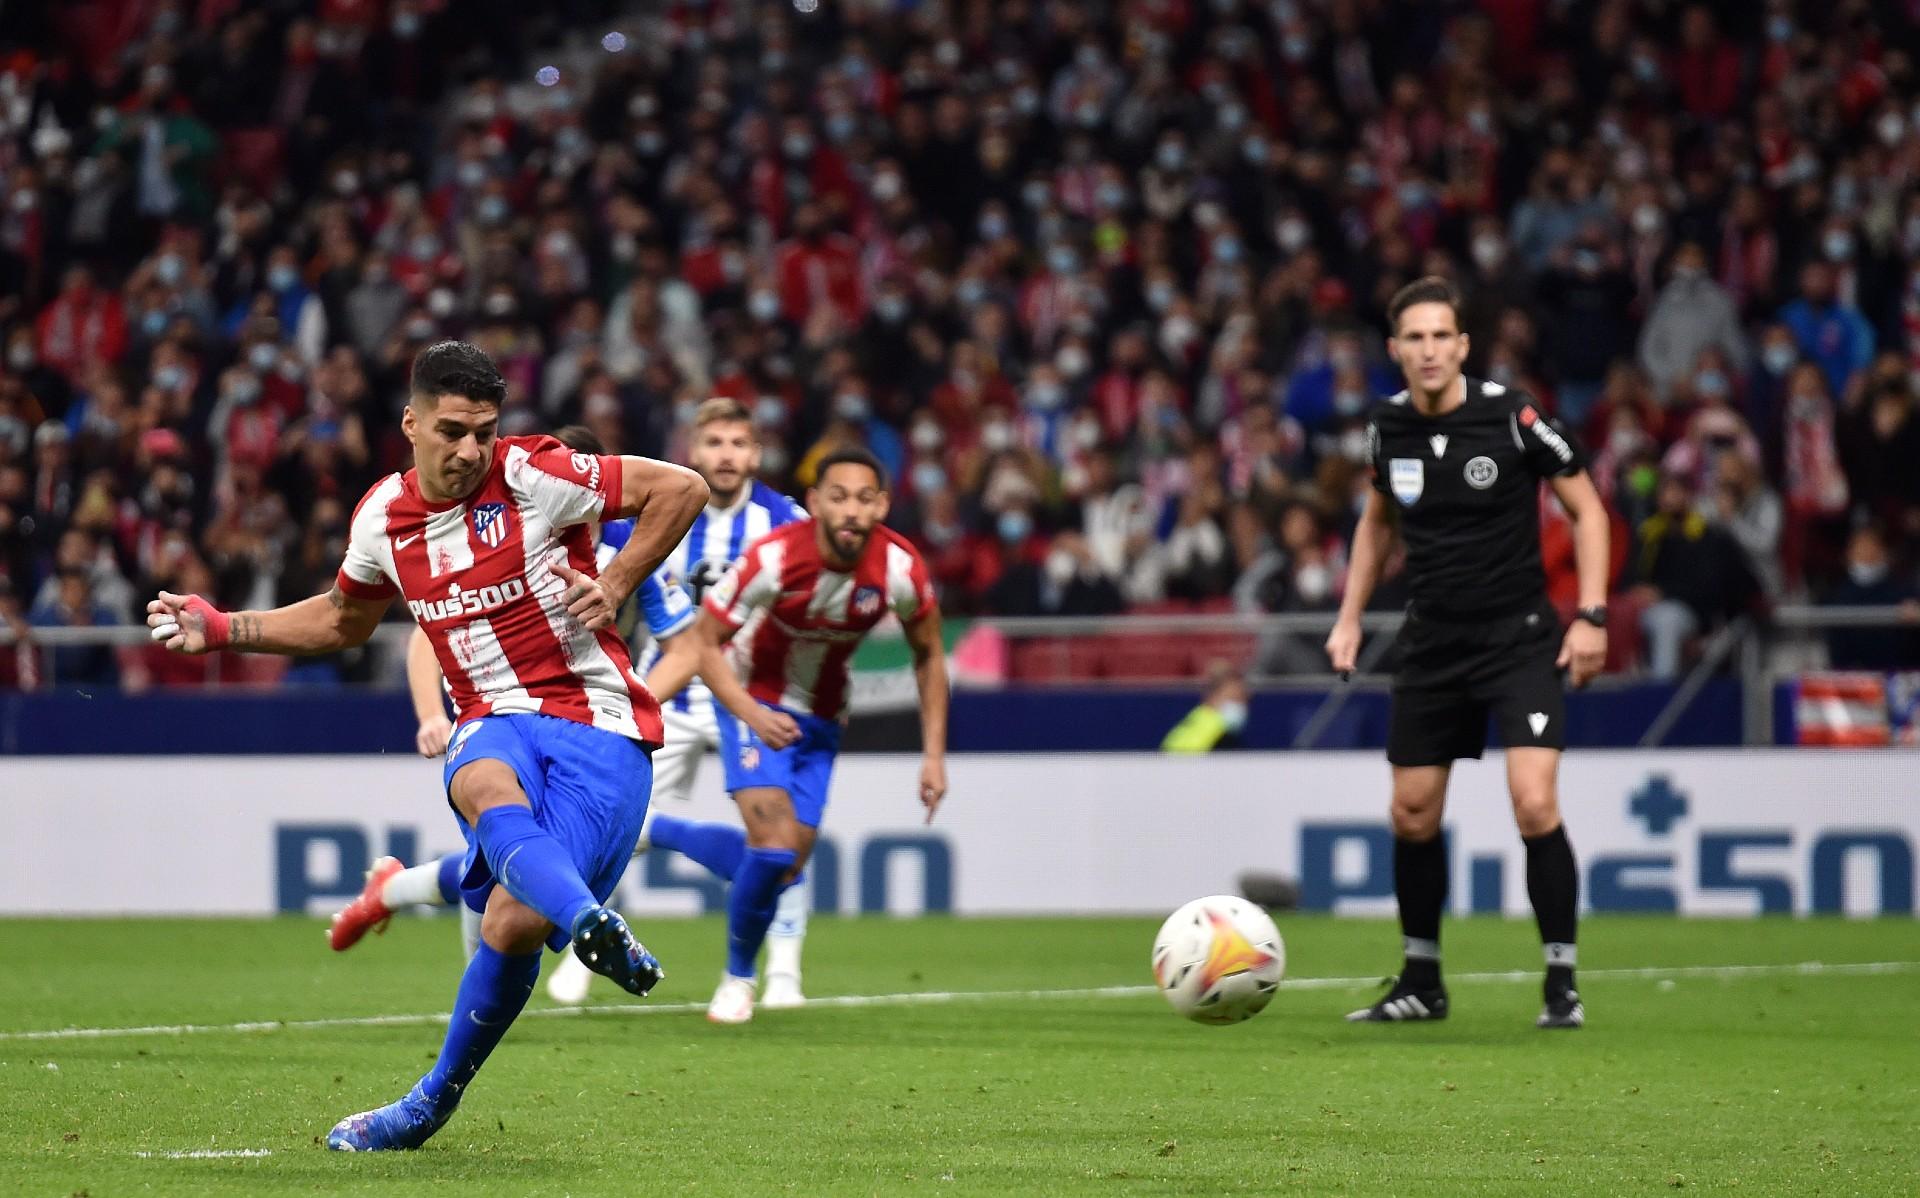 Diego Simeone hails 'extraordinary' Luis Suarez in Real Sociedad draw